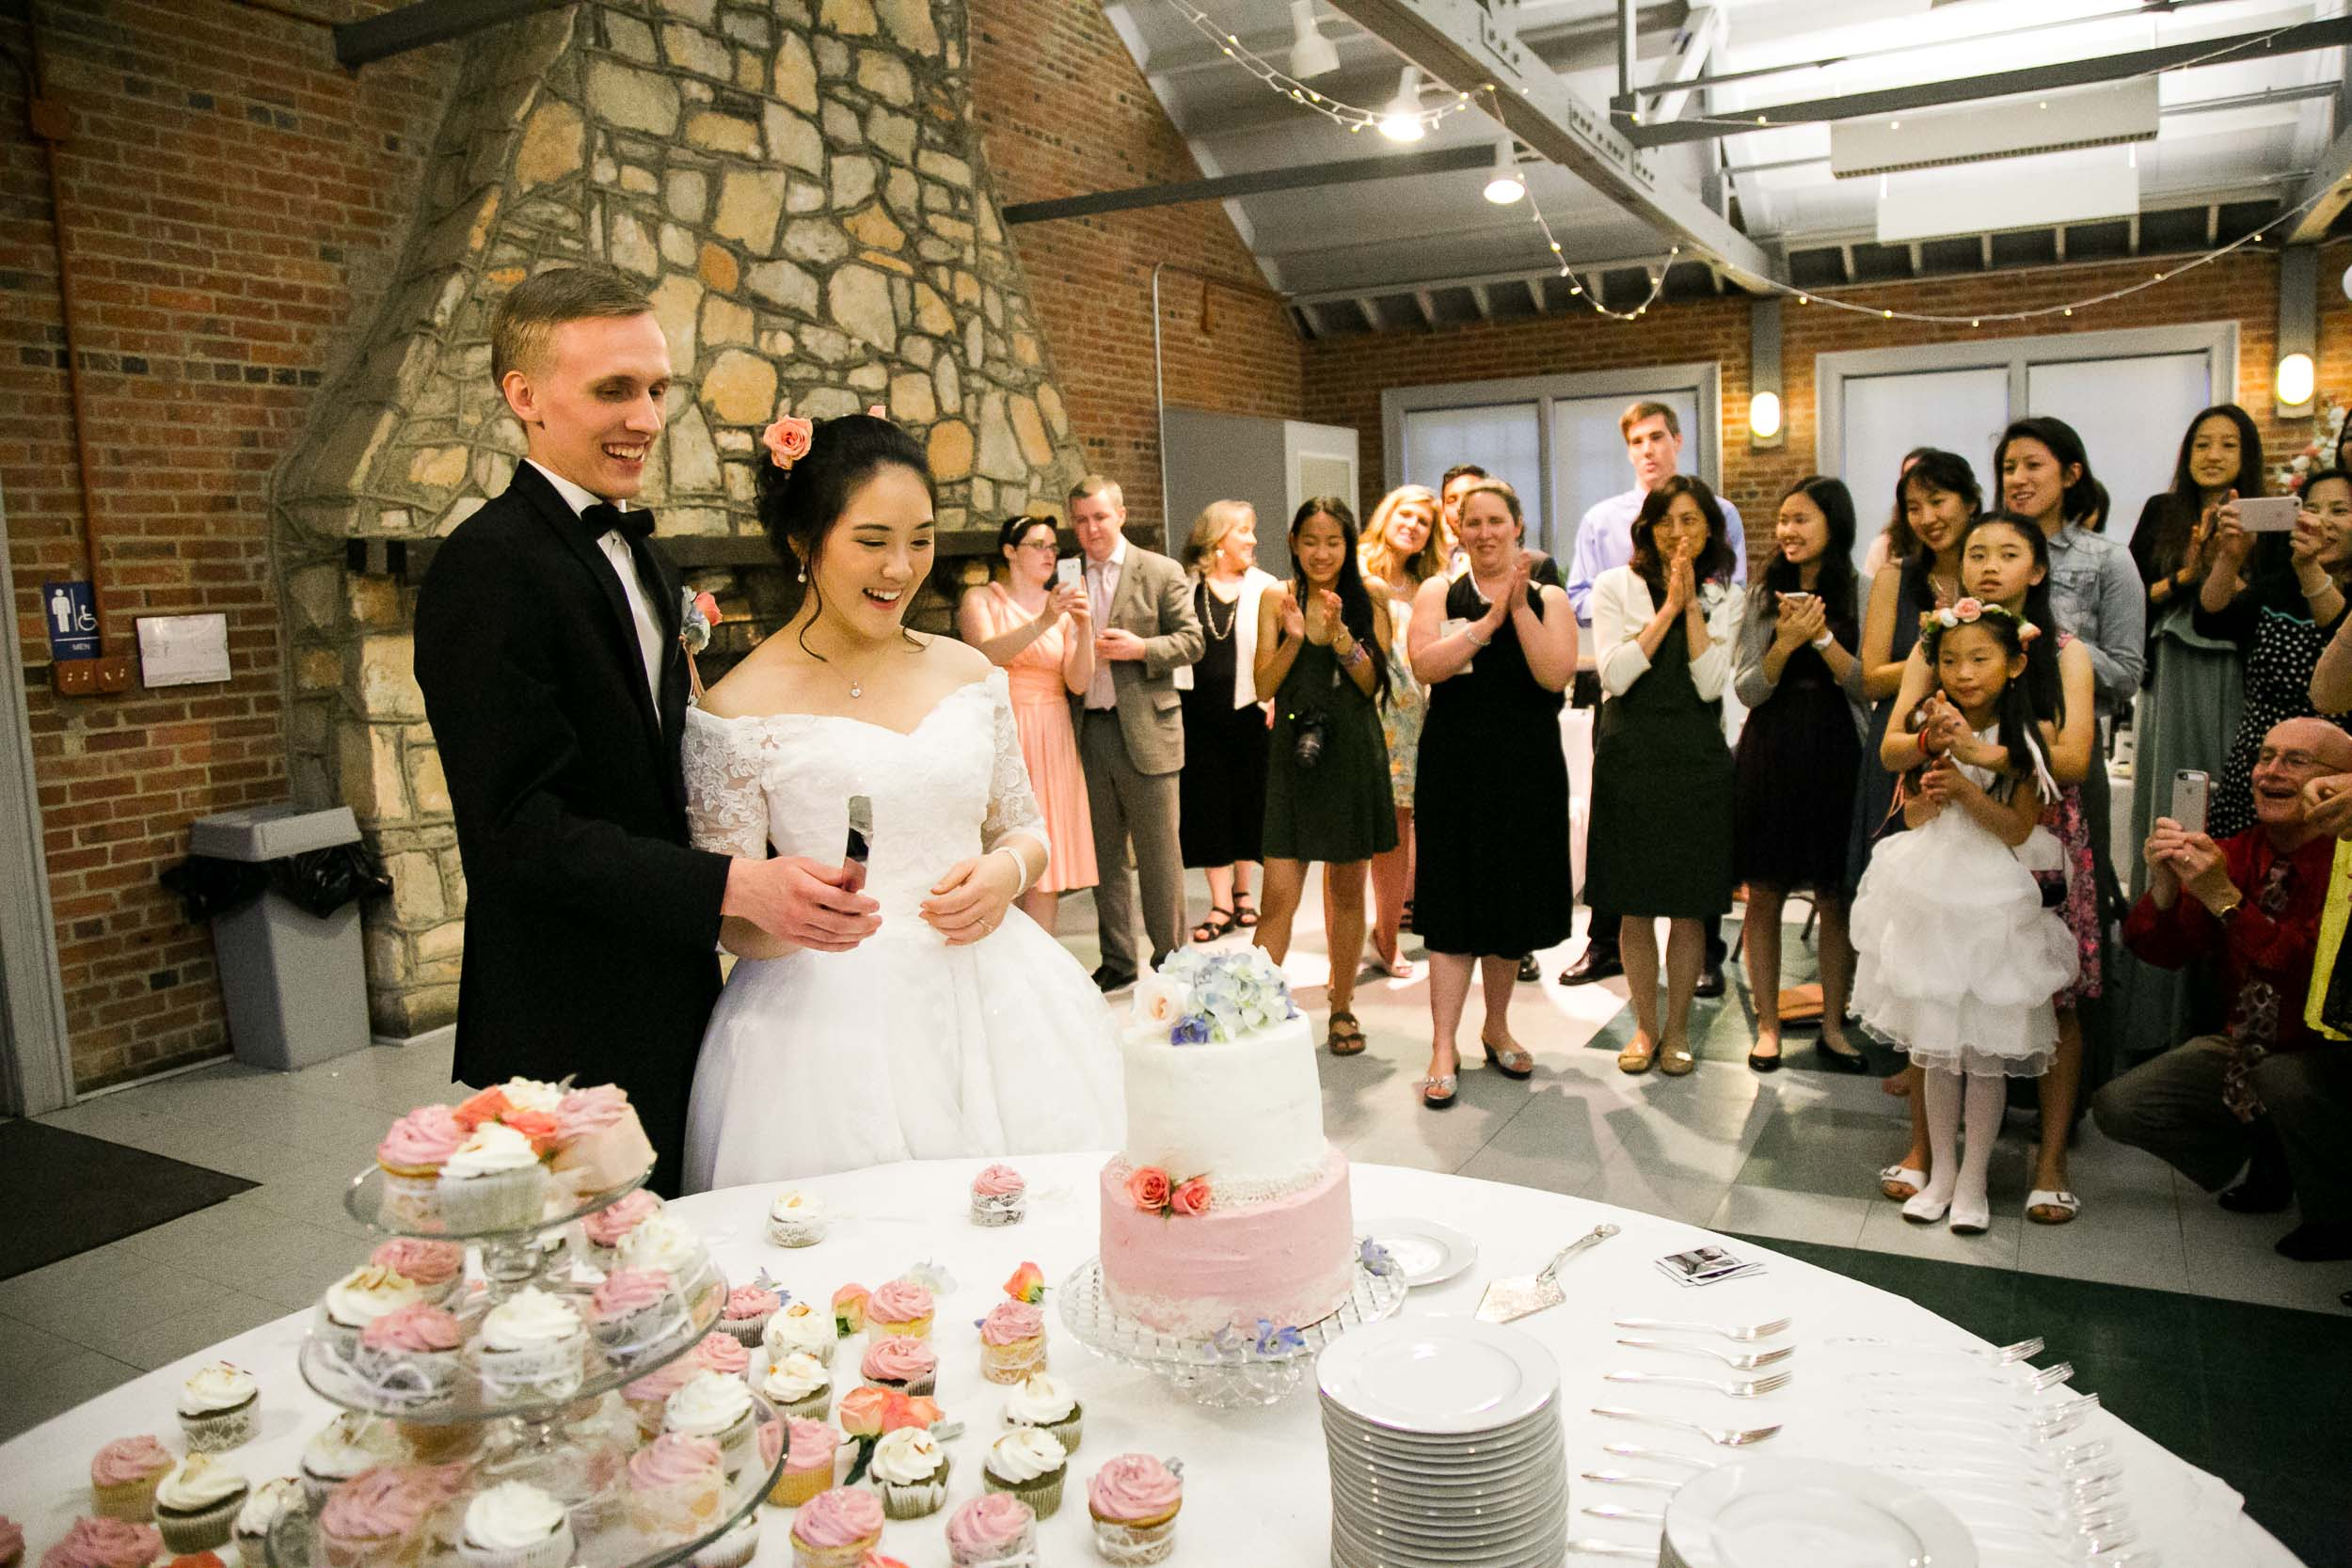 Raleigh Wedding Photographer   G. Lin Photography   Bride and groom cutting the wedding cake